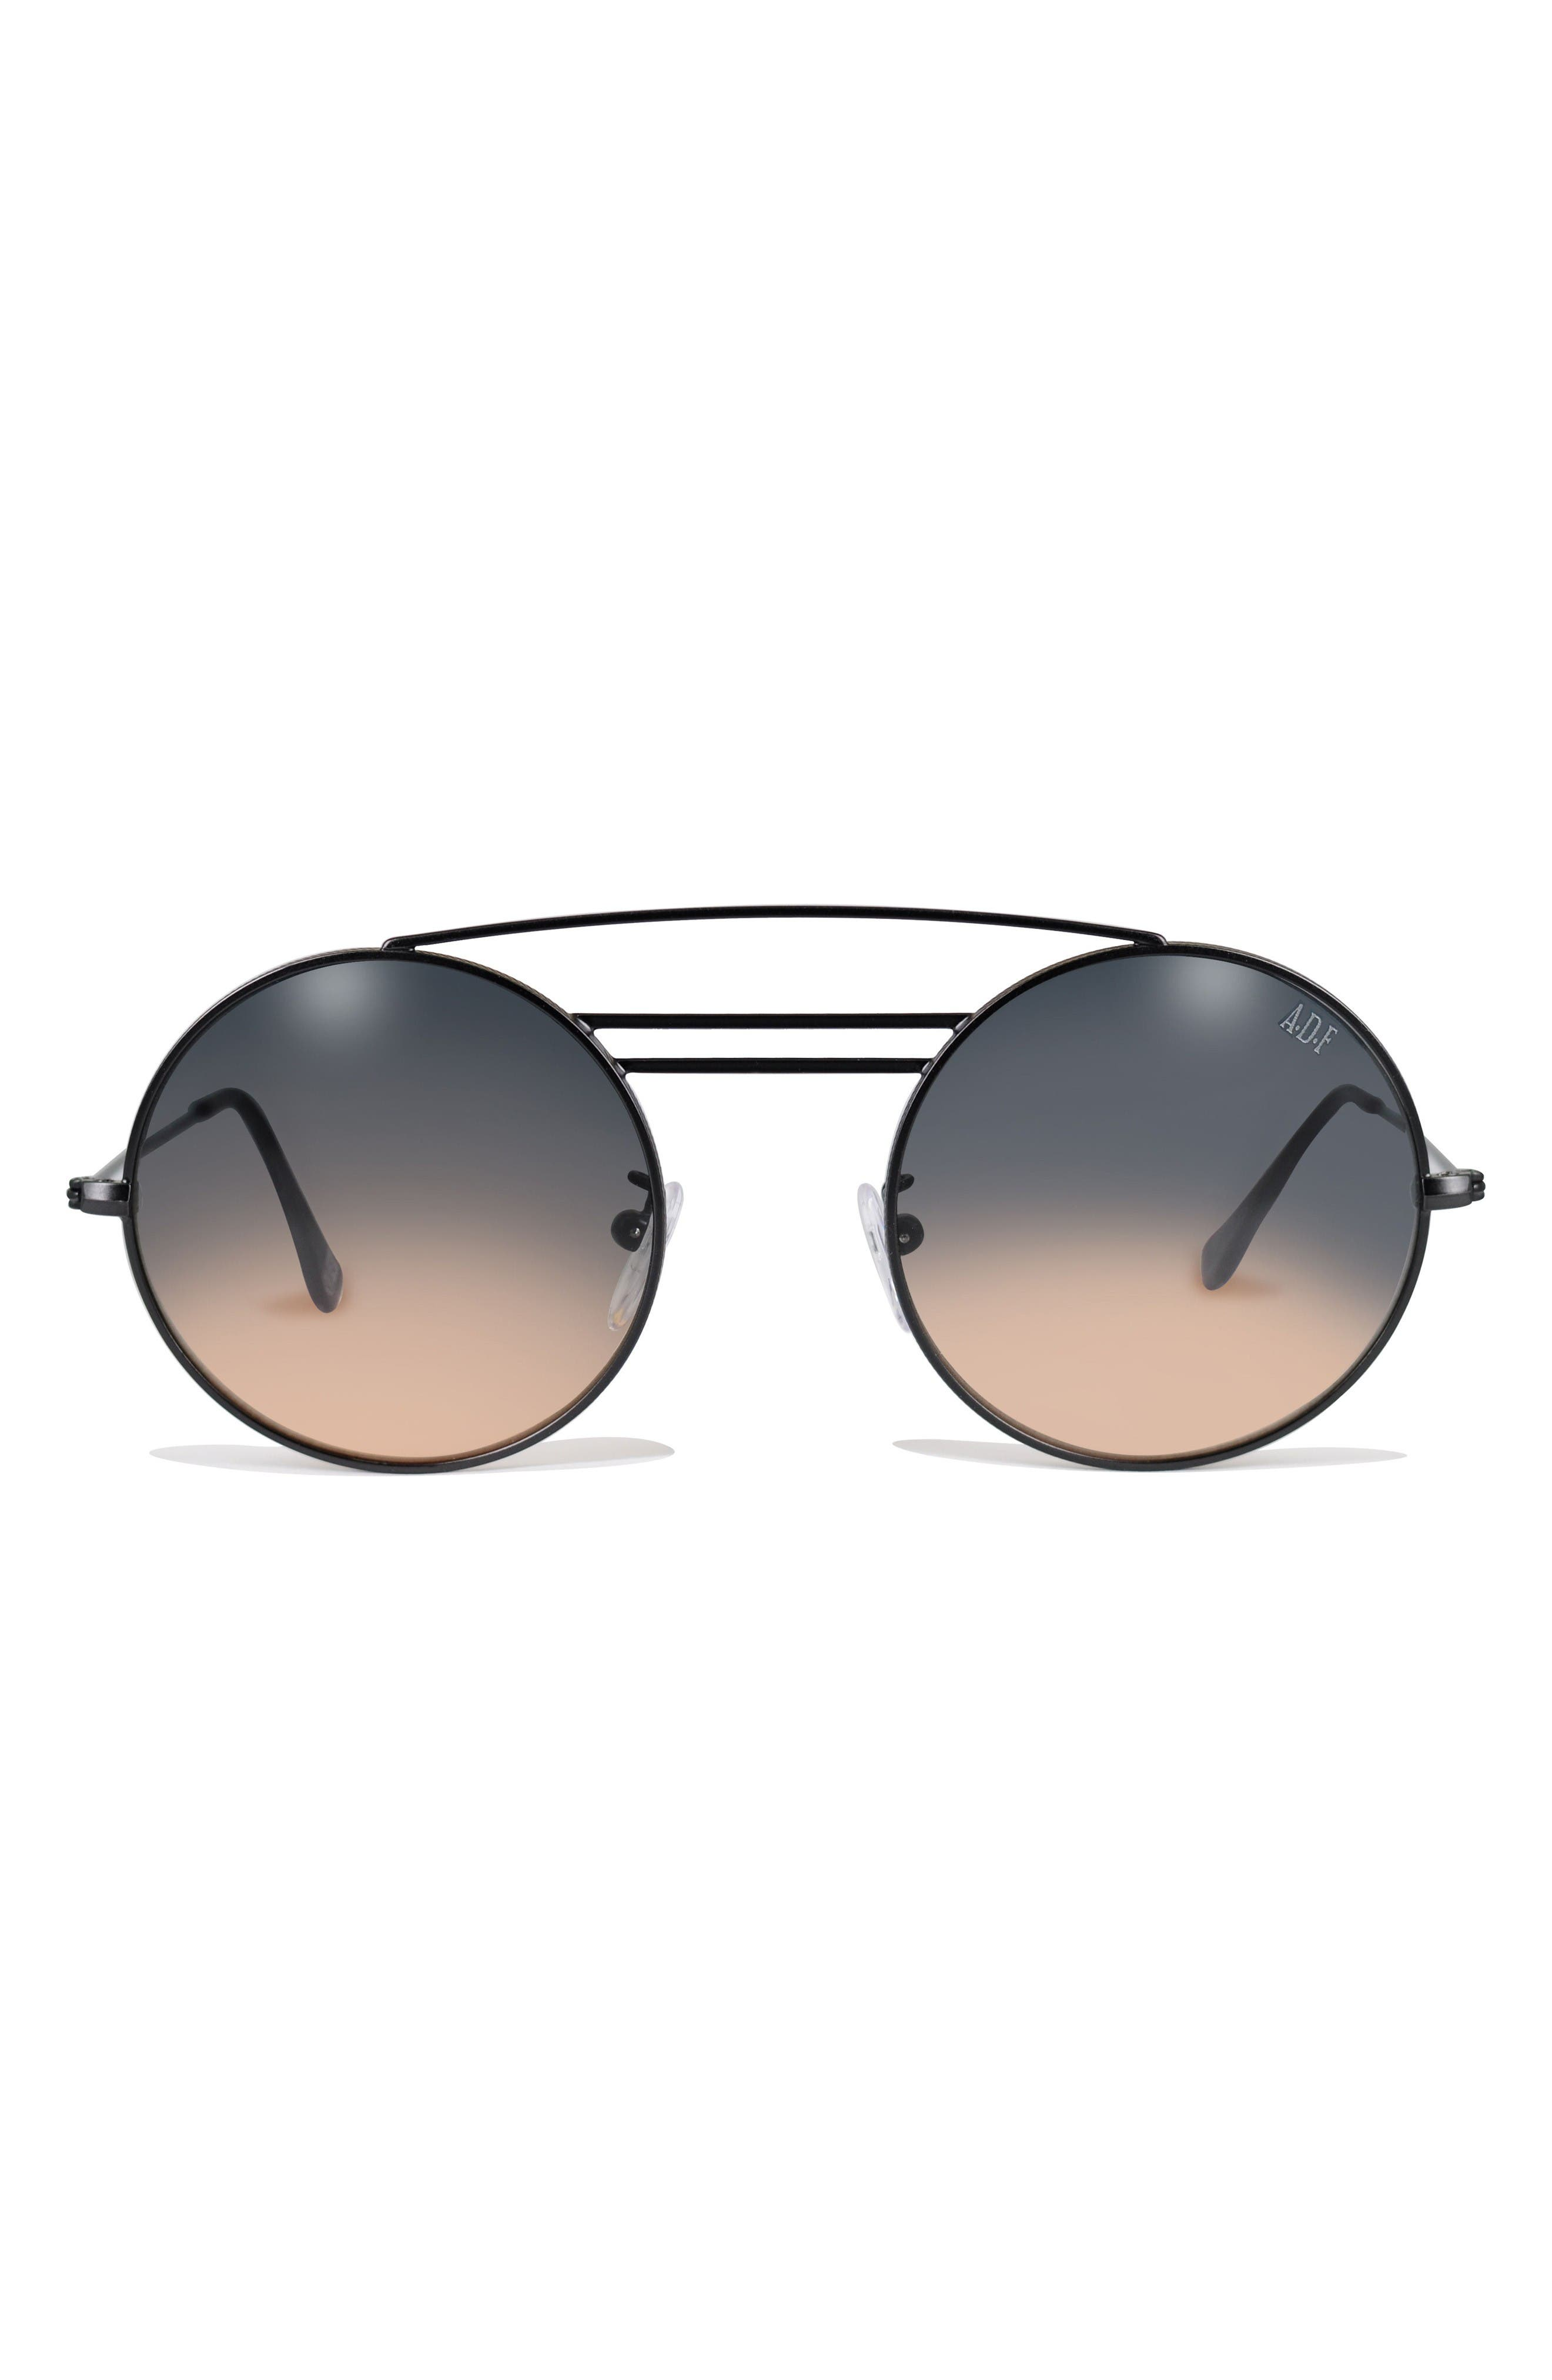 GLASSING Mentalist 48mm Round Sunglasses